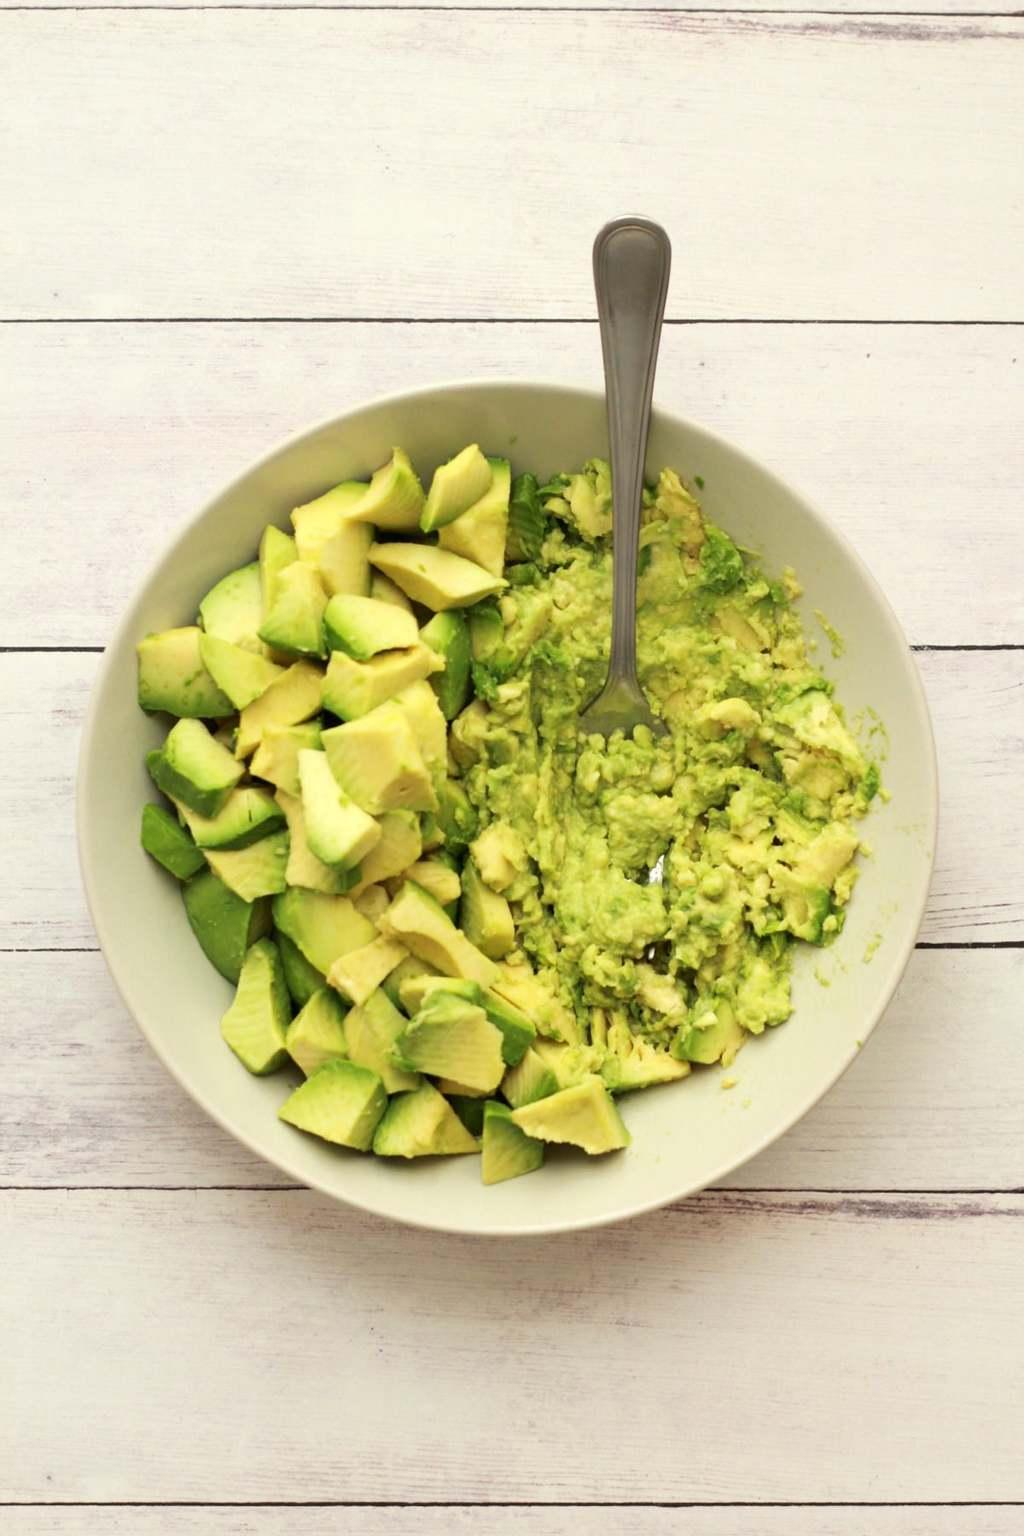 Making Guacamole #vegan #lovingitvegan #guacamole #dips